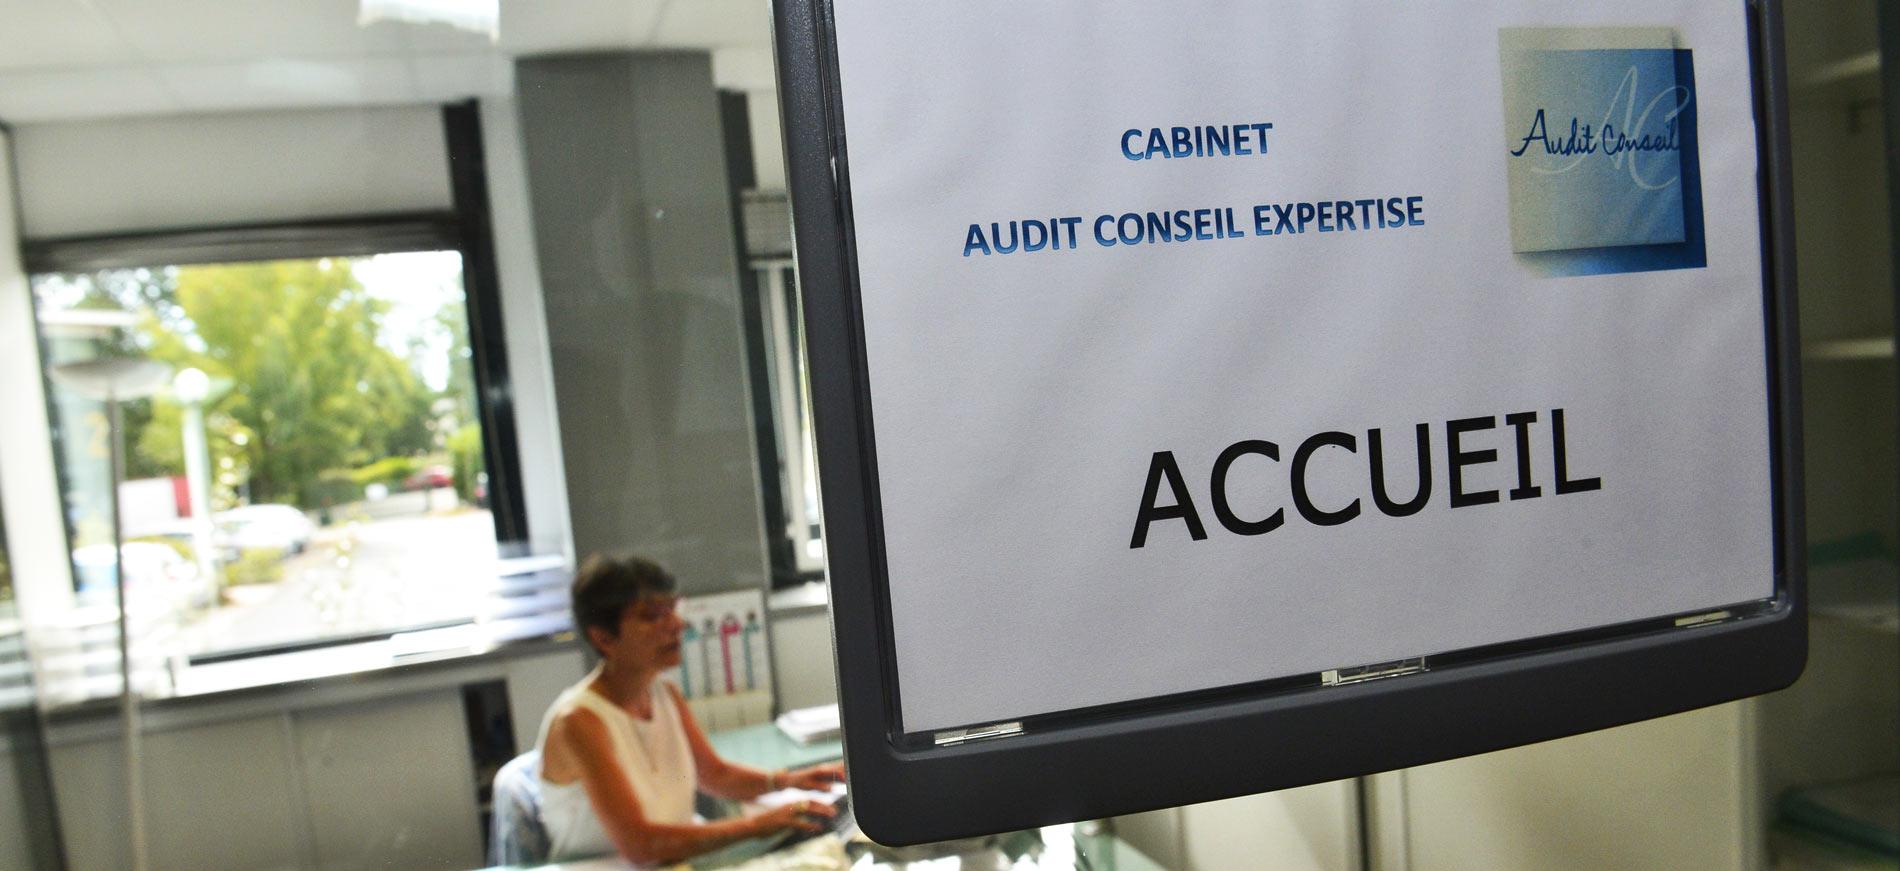 Cabinet audit conseil - Cabinet audit et conseil ...